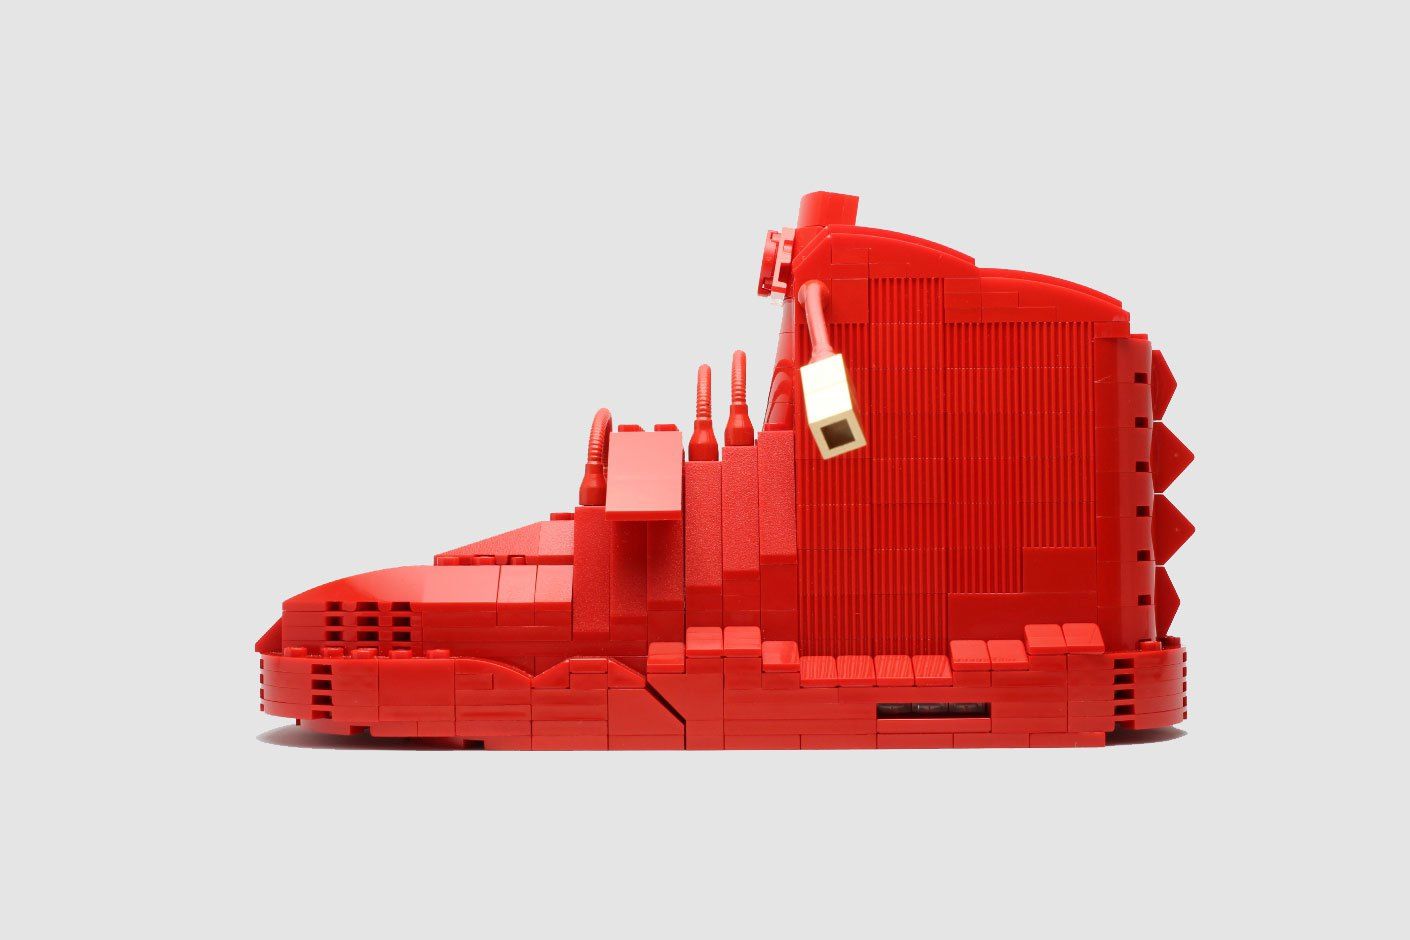 tom-yoo-lego-sneakers-111